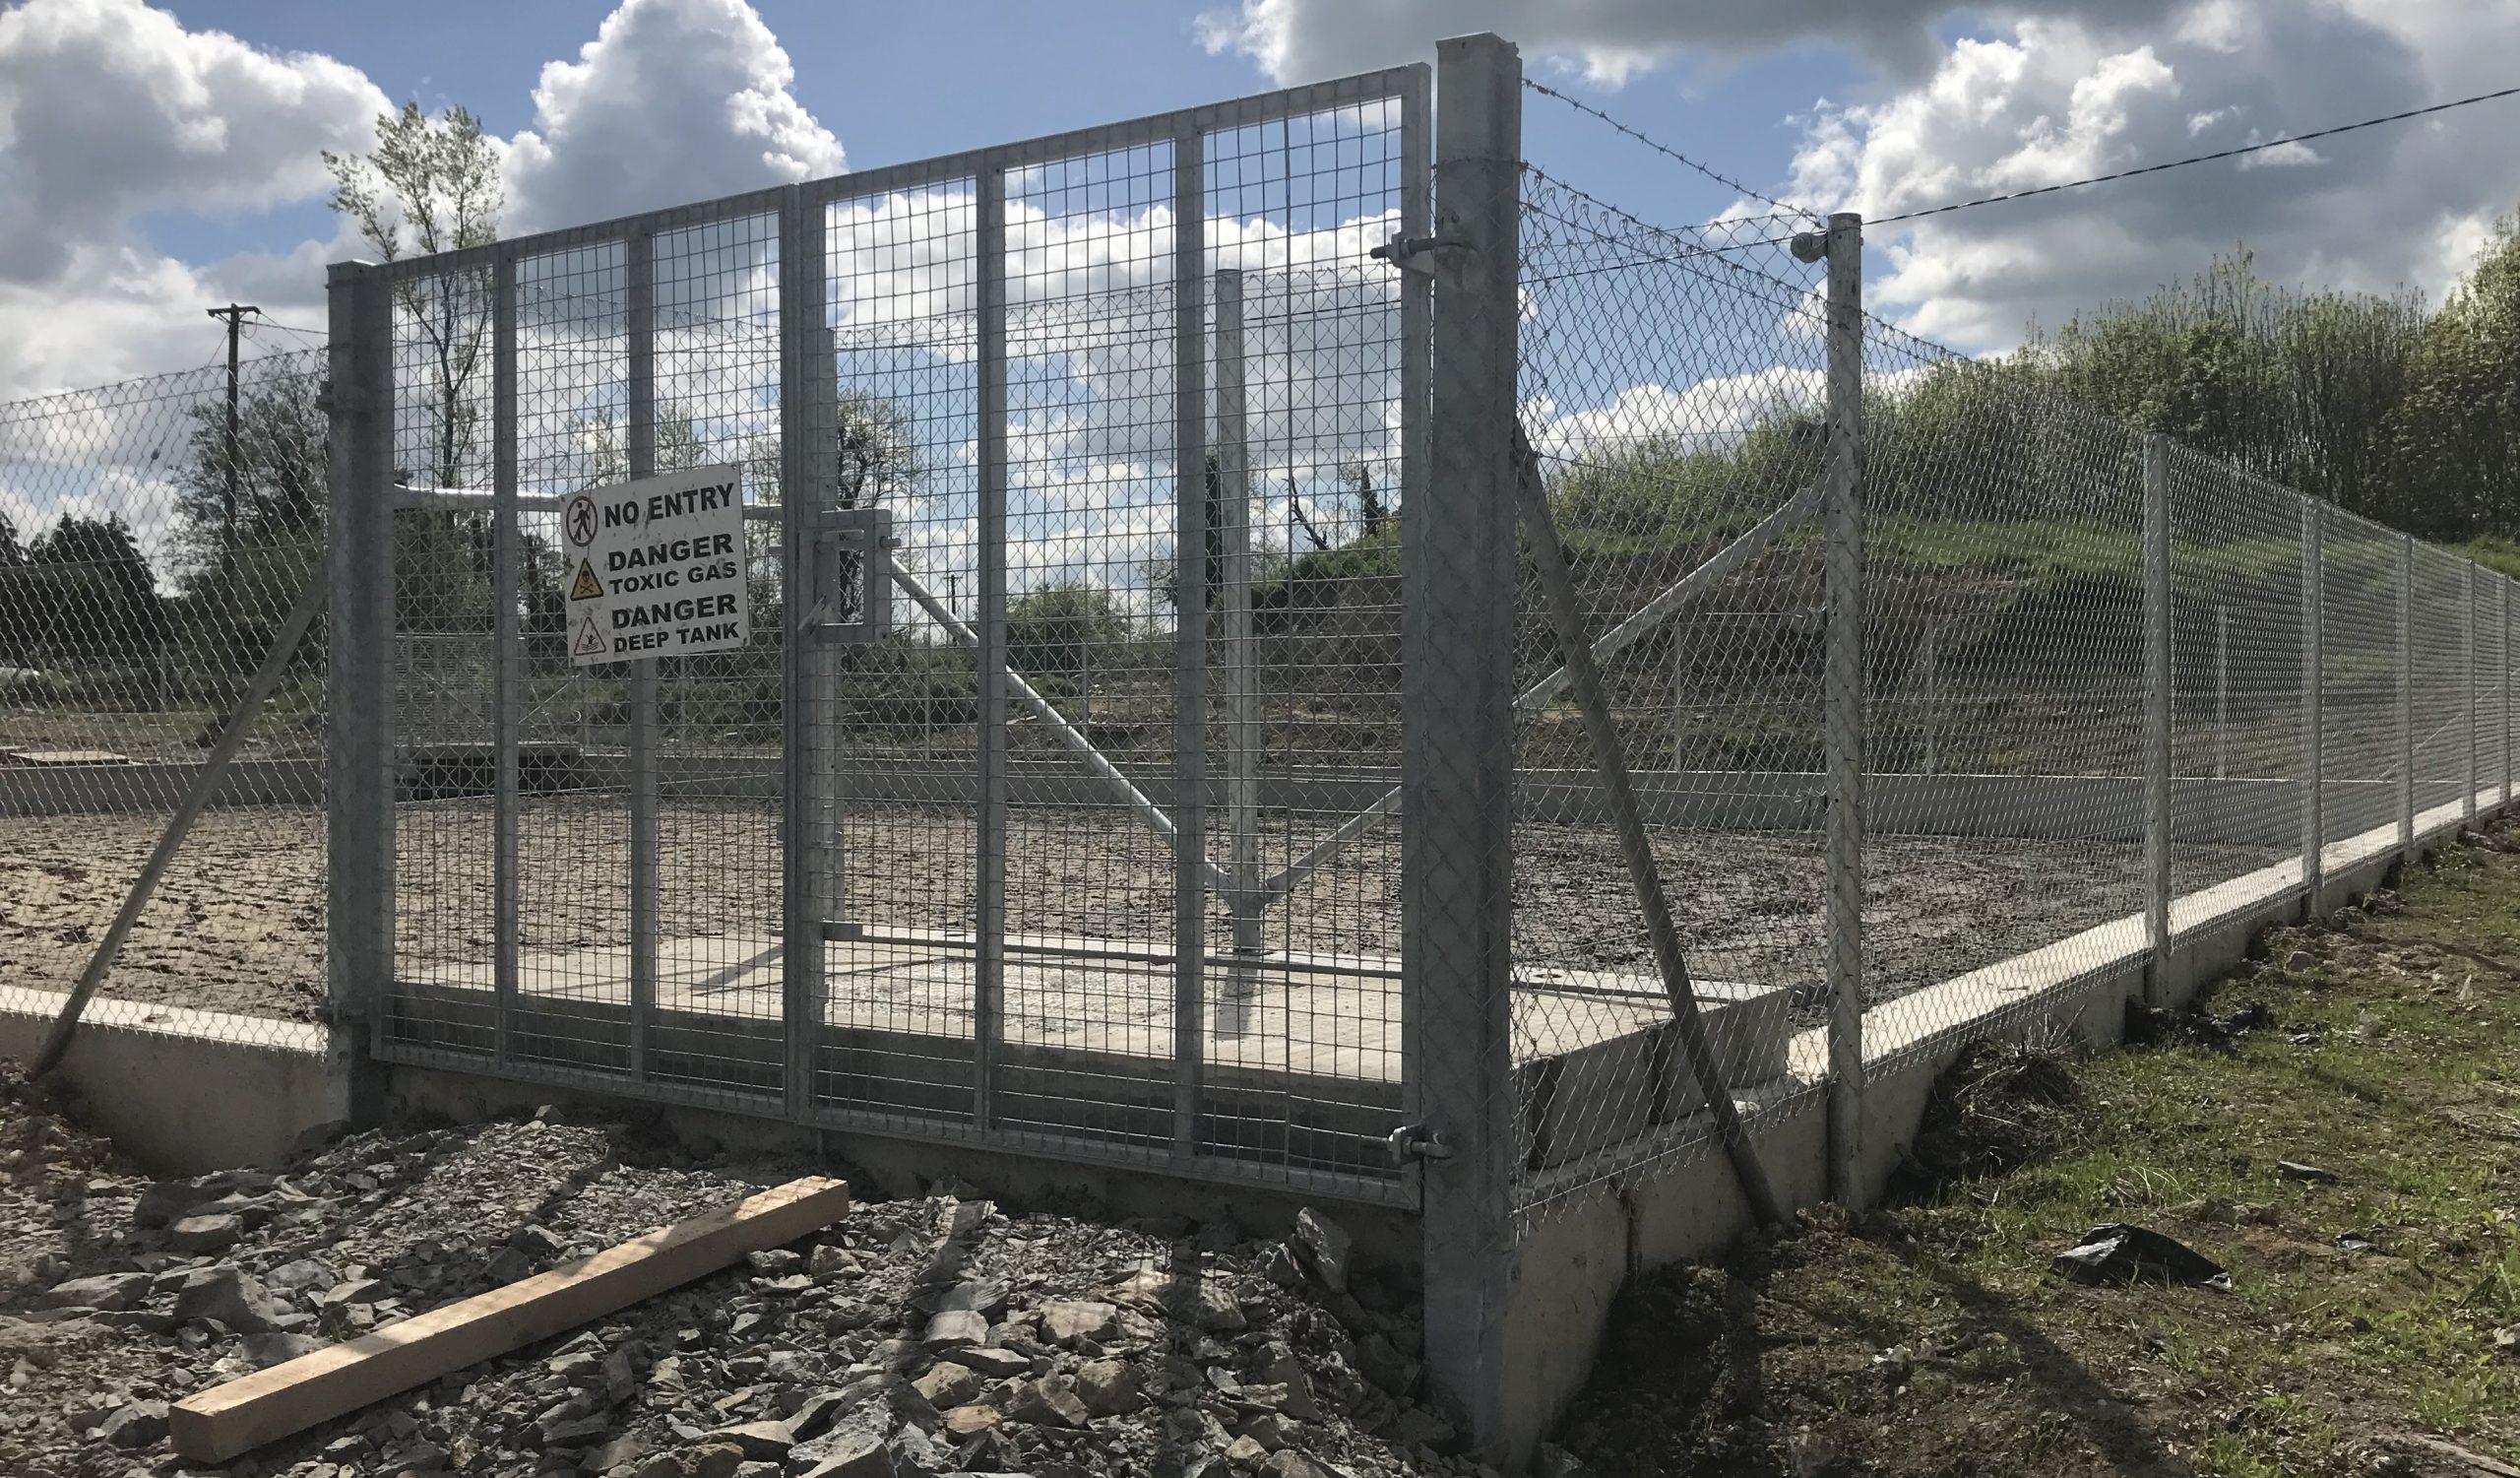 slurry-dangers-fencing